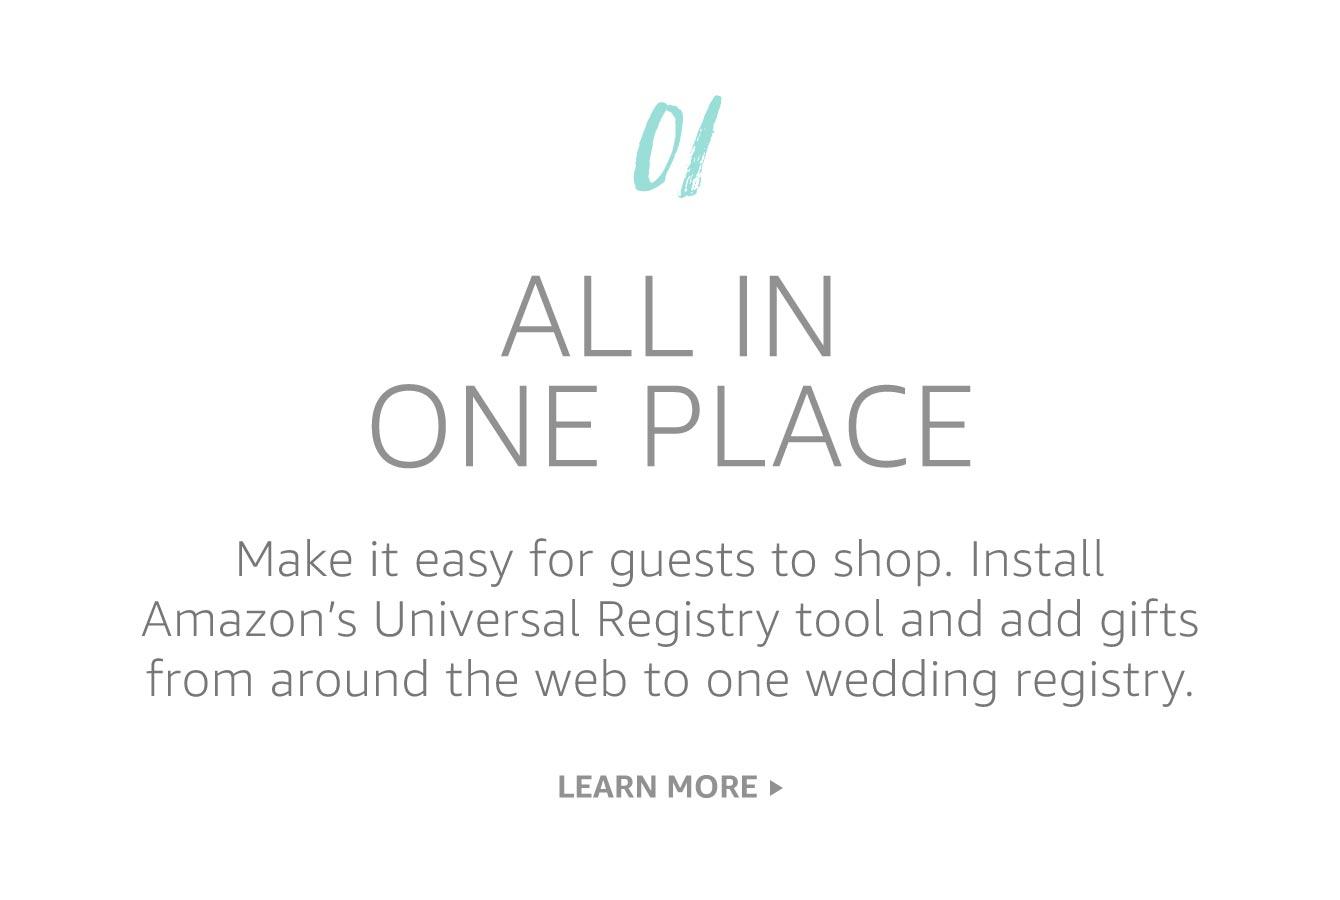 Wedding Registry Benefits Discounts Amazon Bridal And Wedding Gifts